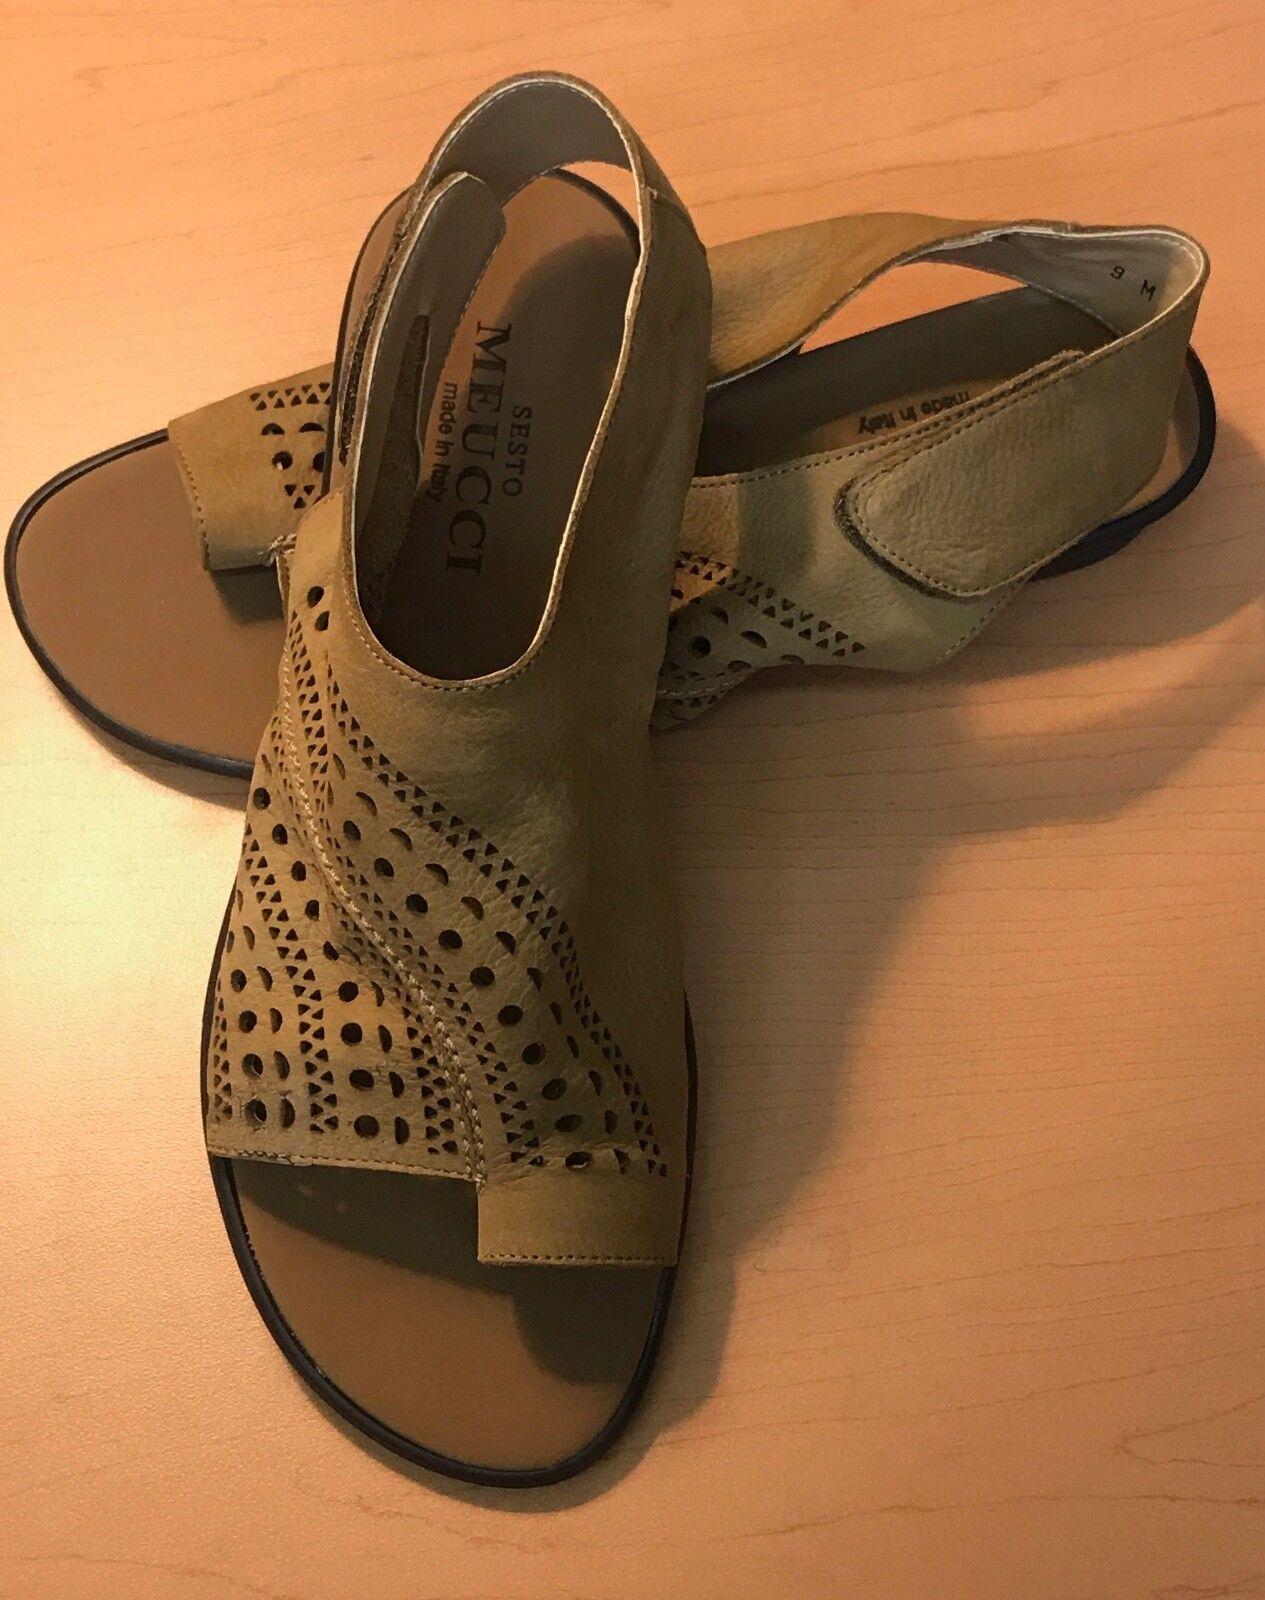 Damenschuhe Schuhes Sesto Meucci Elax Camel Softna Leder Narrow Width 6 Retail